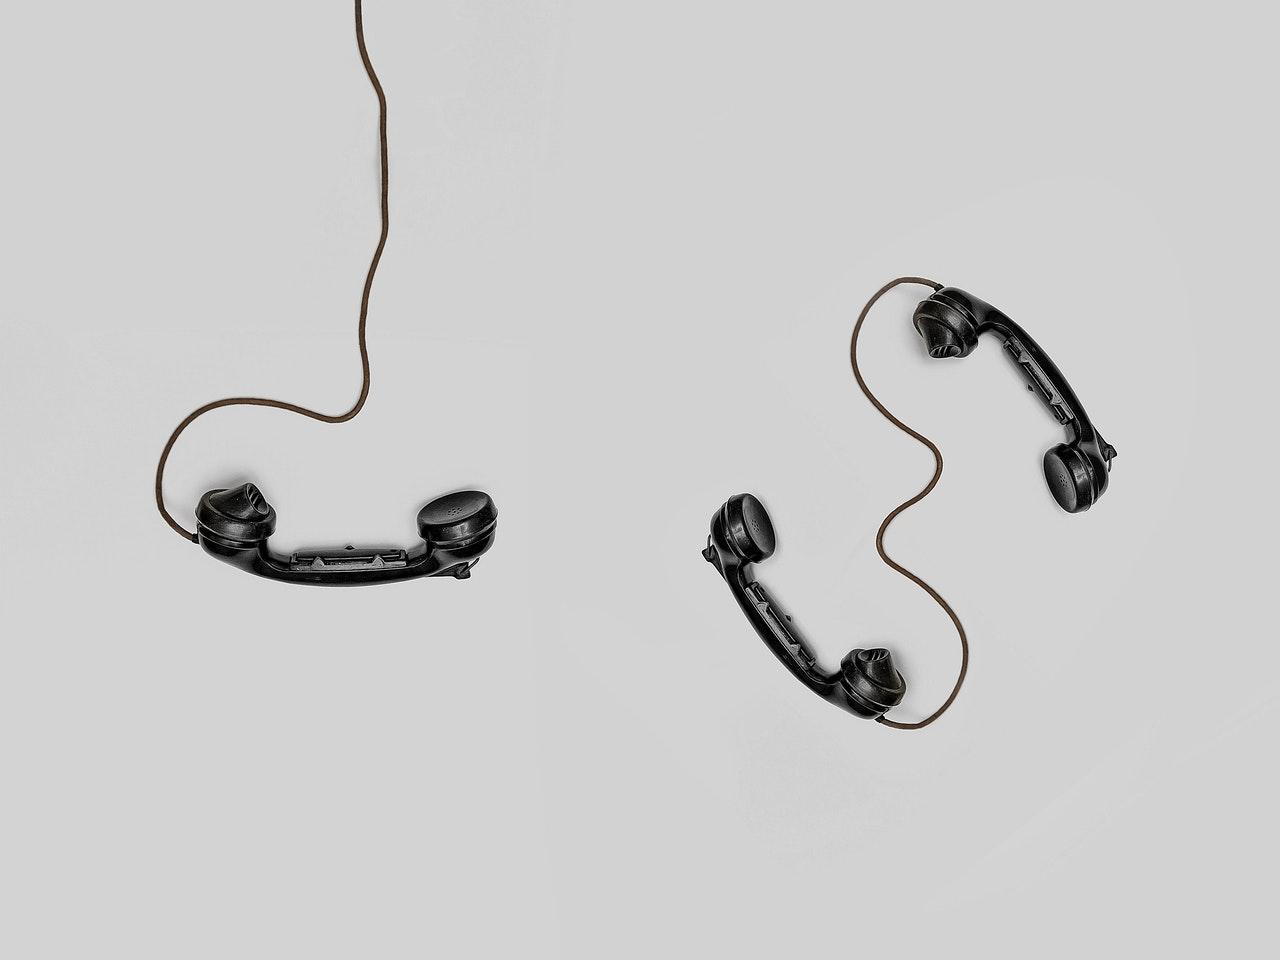 telefoane contacteaza-ne smartdoctor